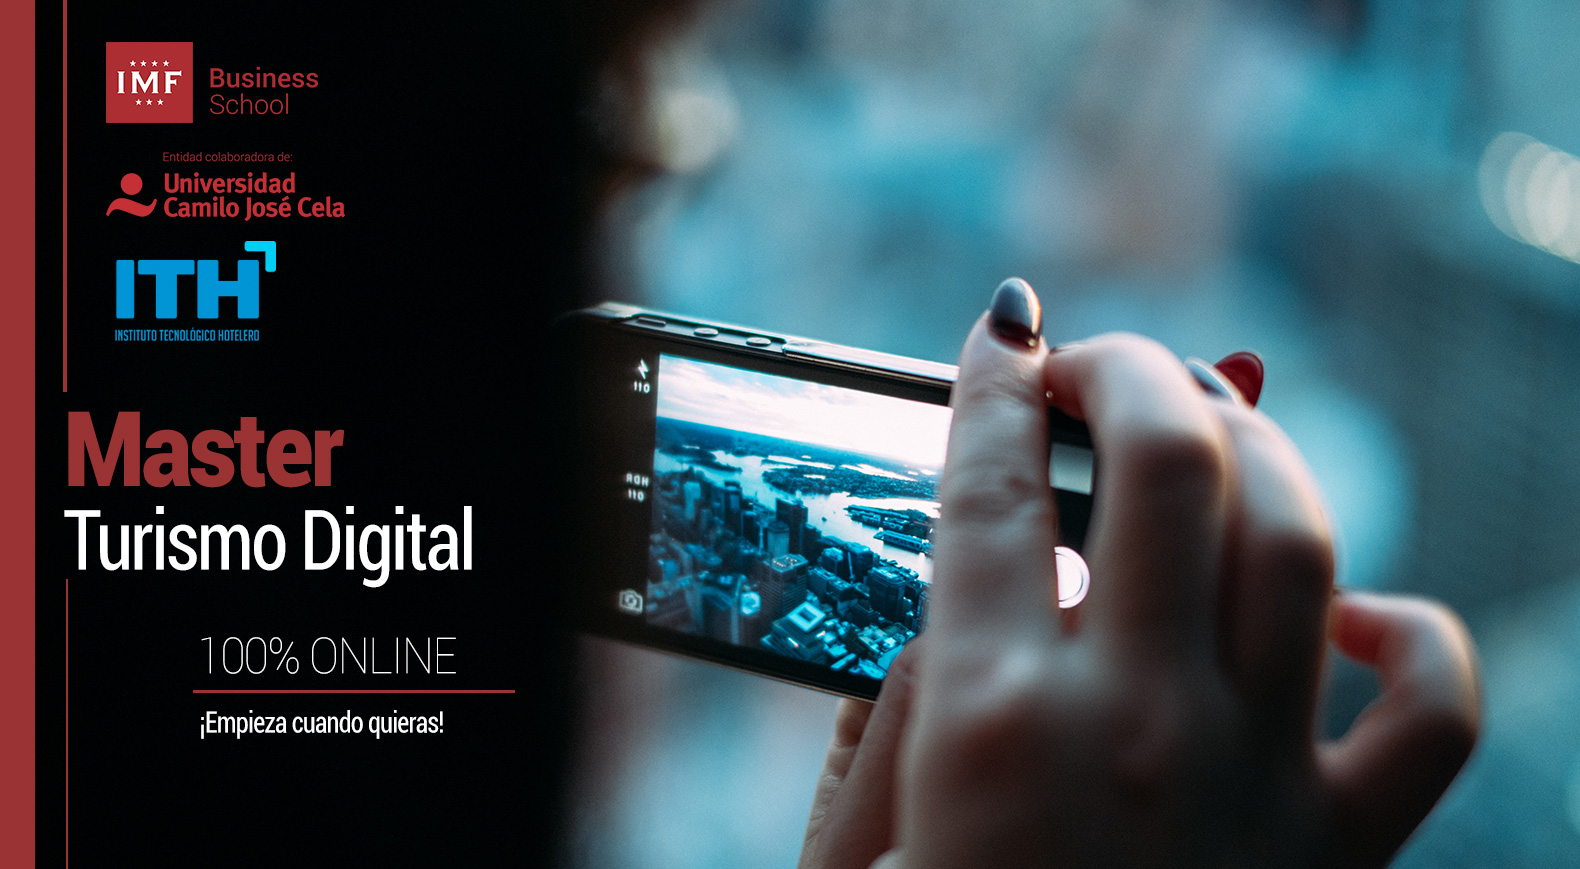 Master en Marketing Turistico Digital